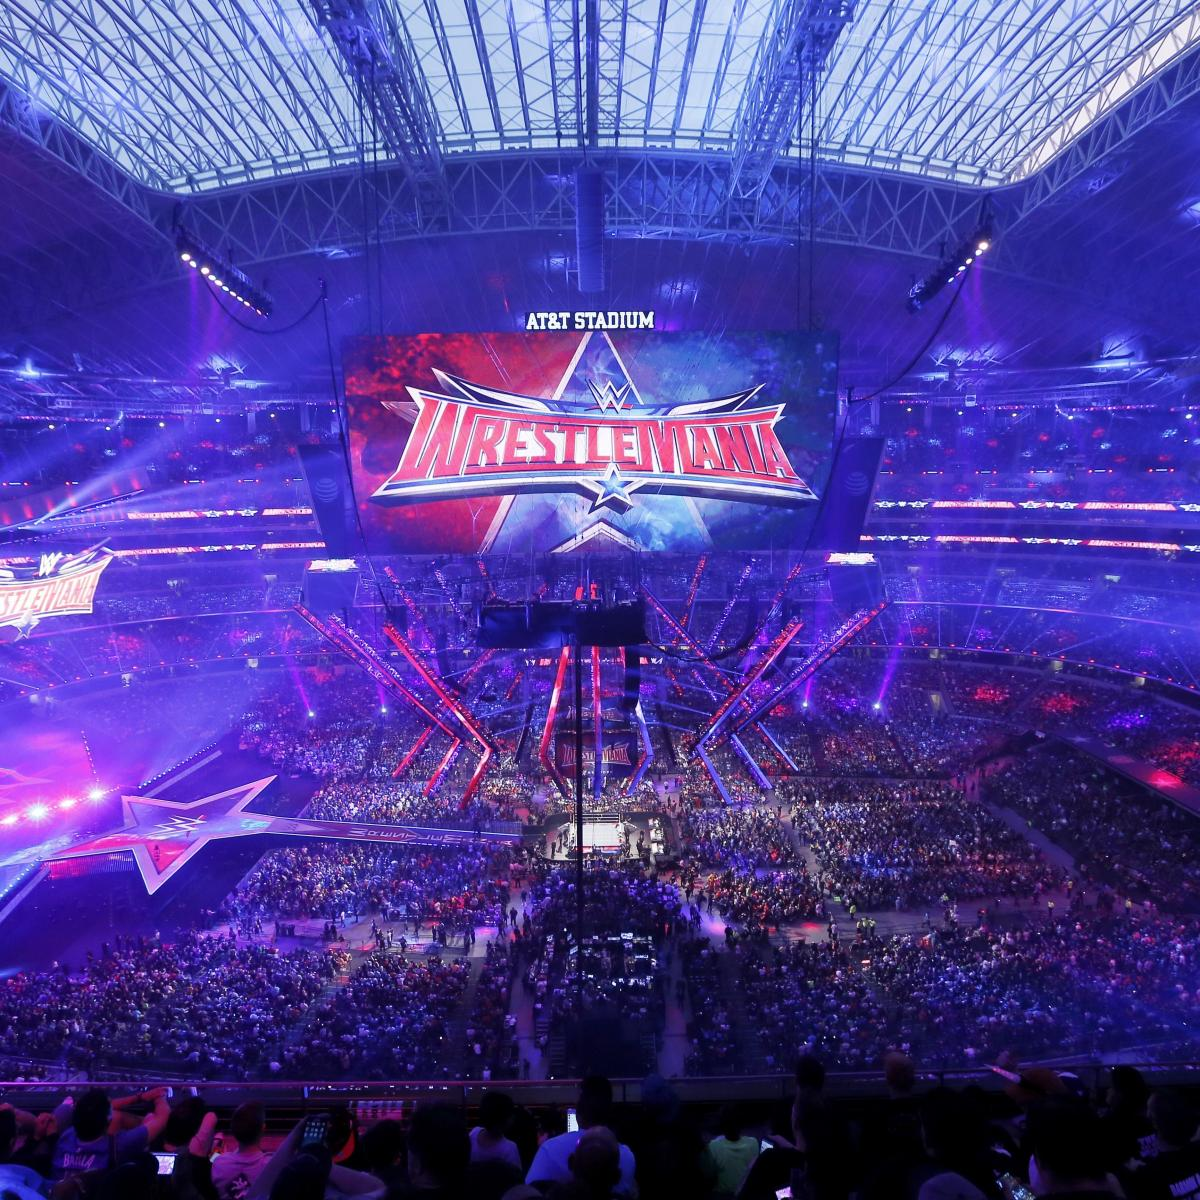 WWE WrestleMania on Fox PPV, Vince McMahon's Promo Stance, Kairi Sane Update